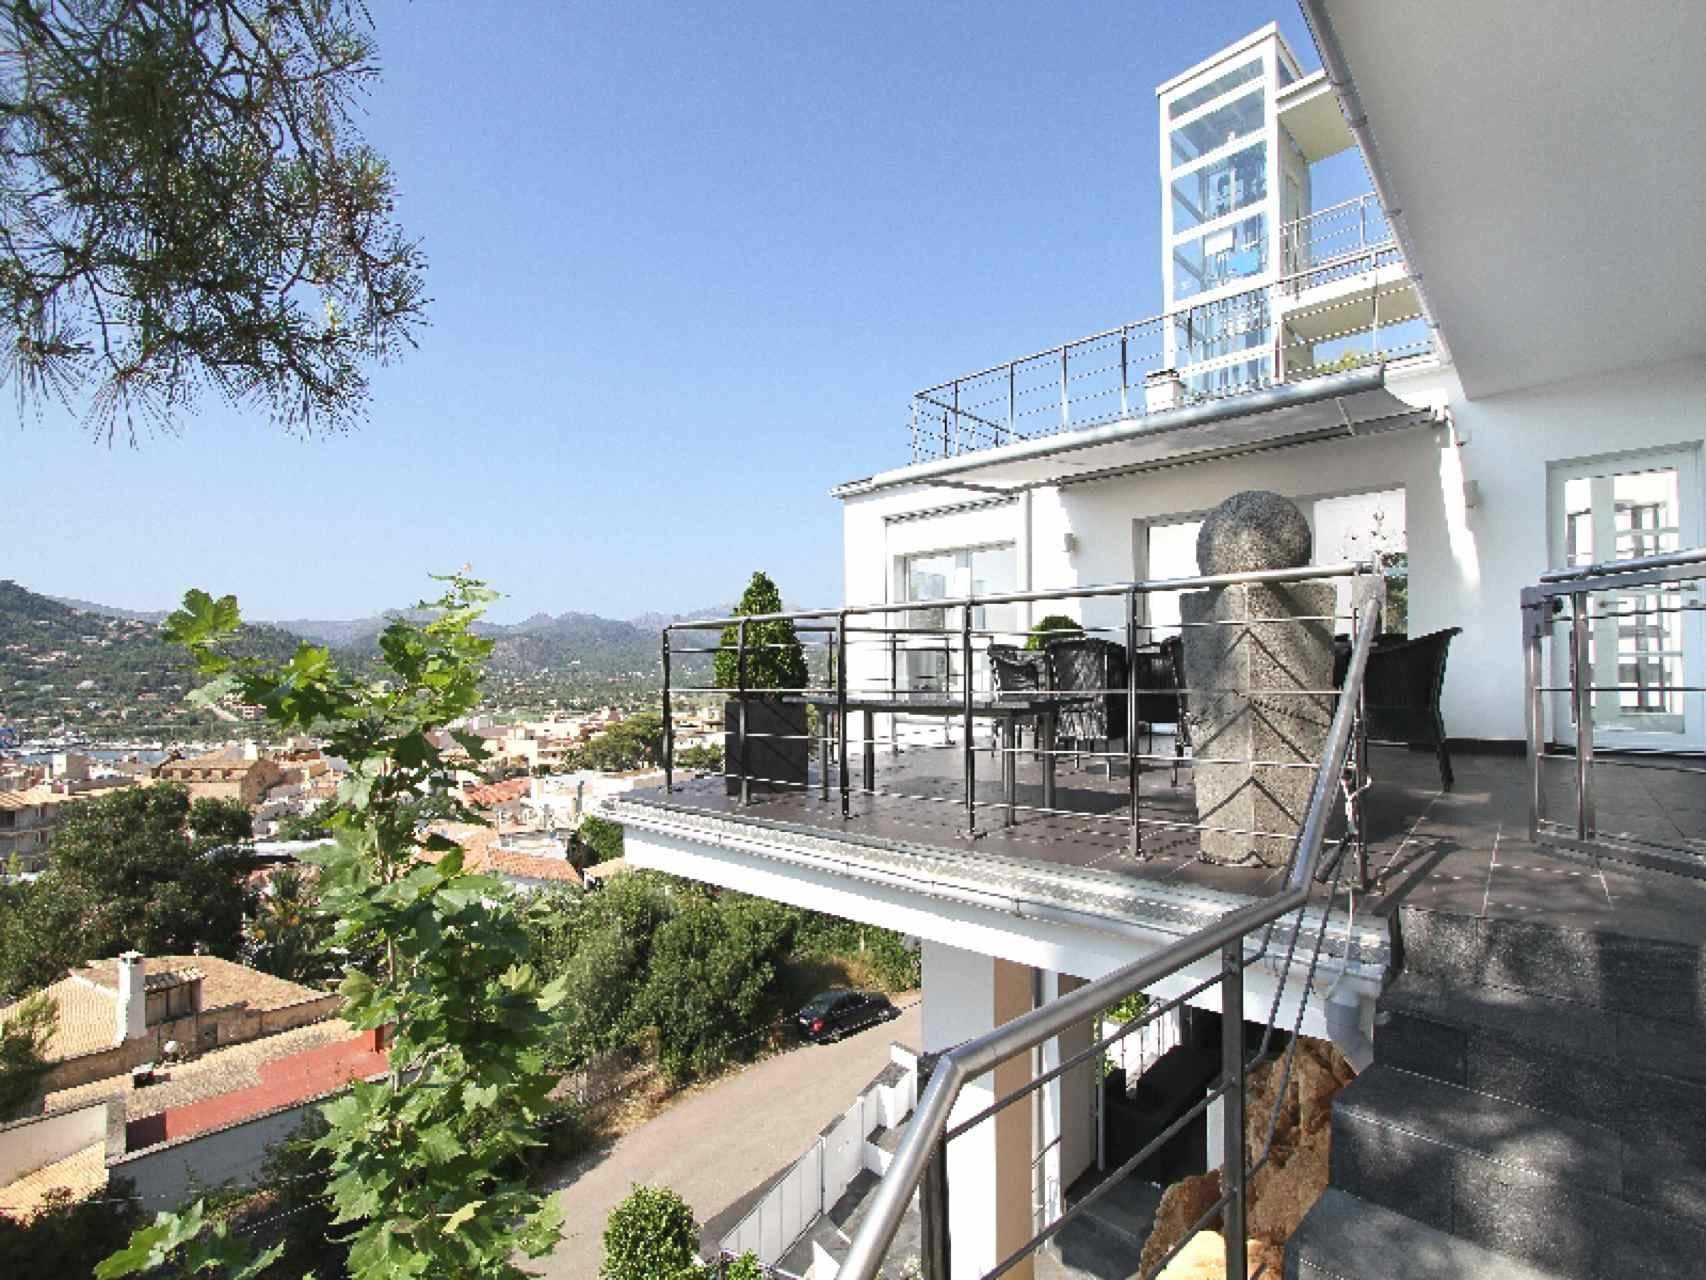 01-04 Bauhaus Villa Mallorca Südwesten Bild 8